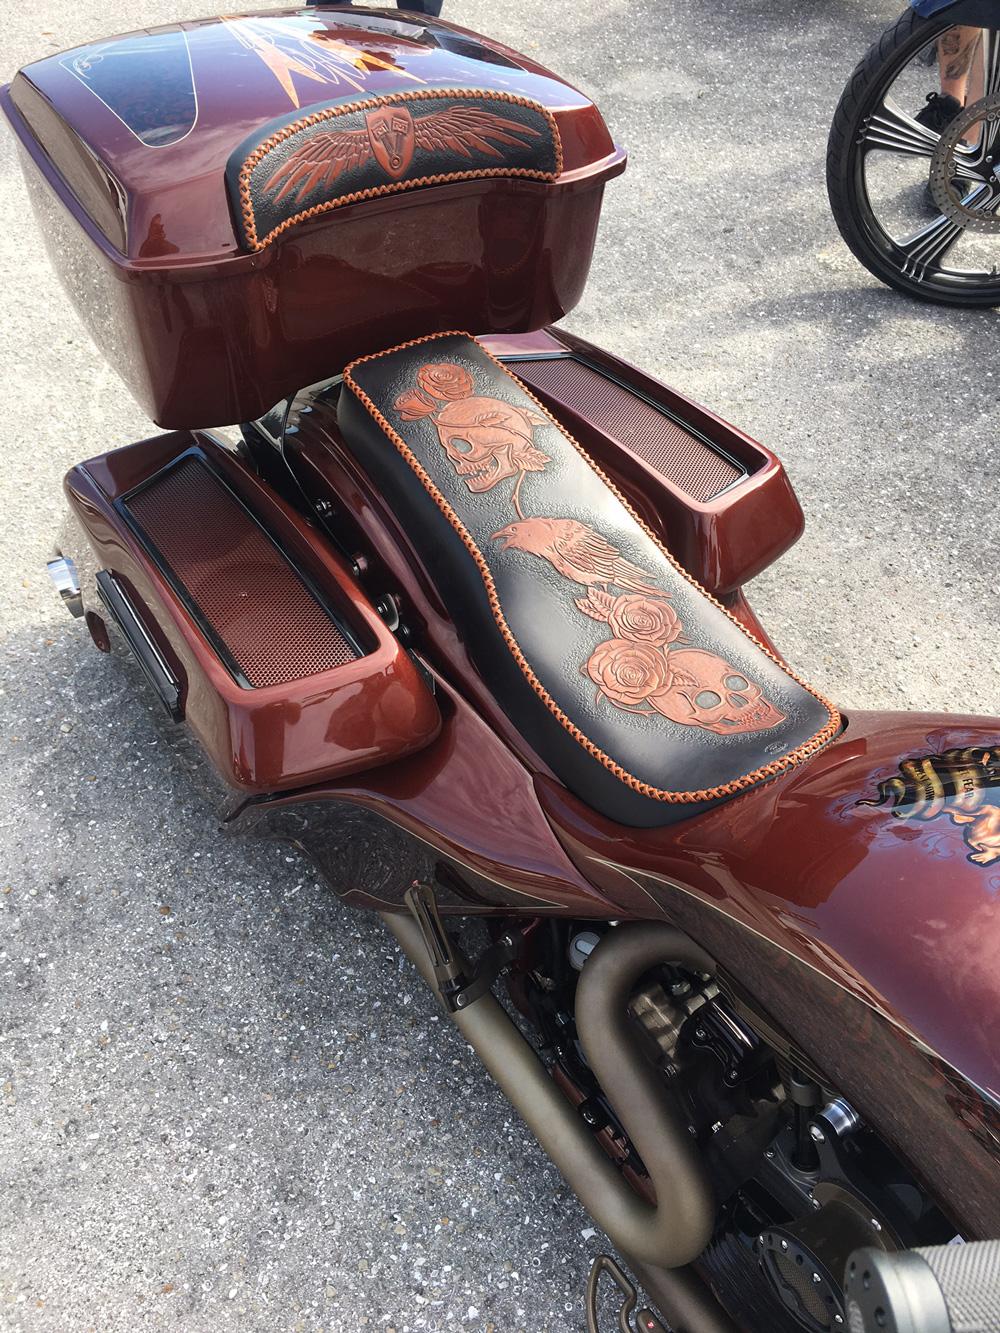 Harley Davidson Road Glide Embroidered Seat